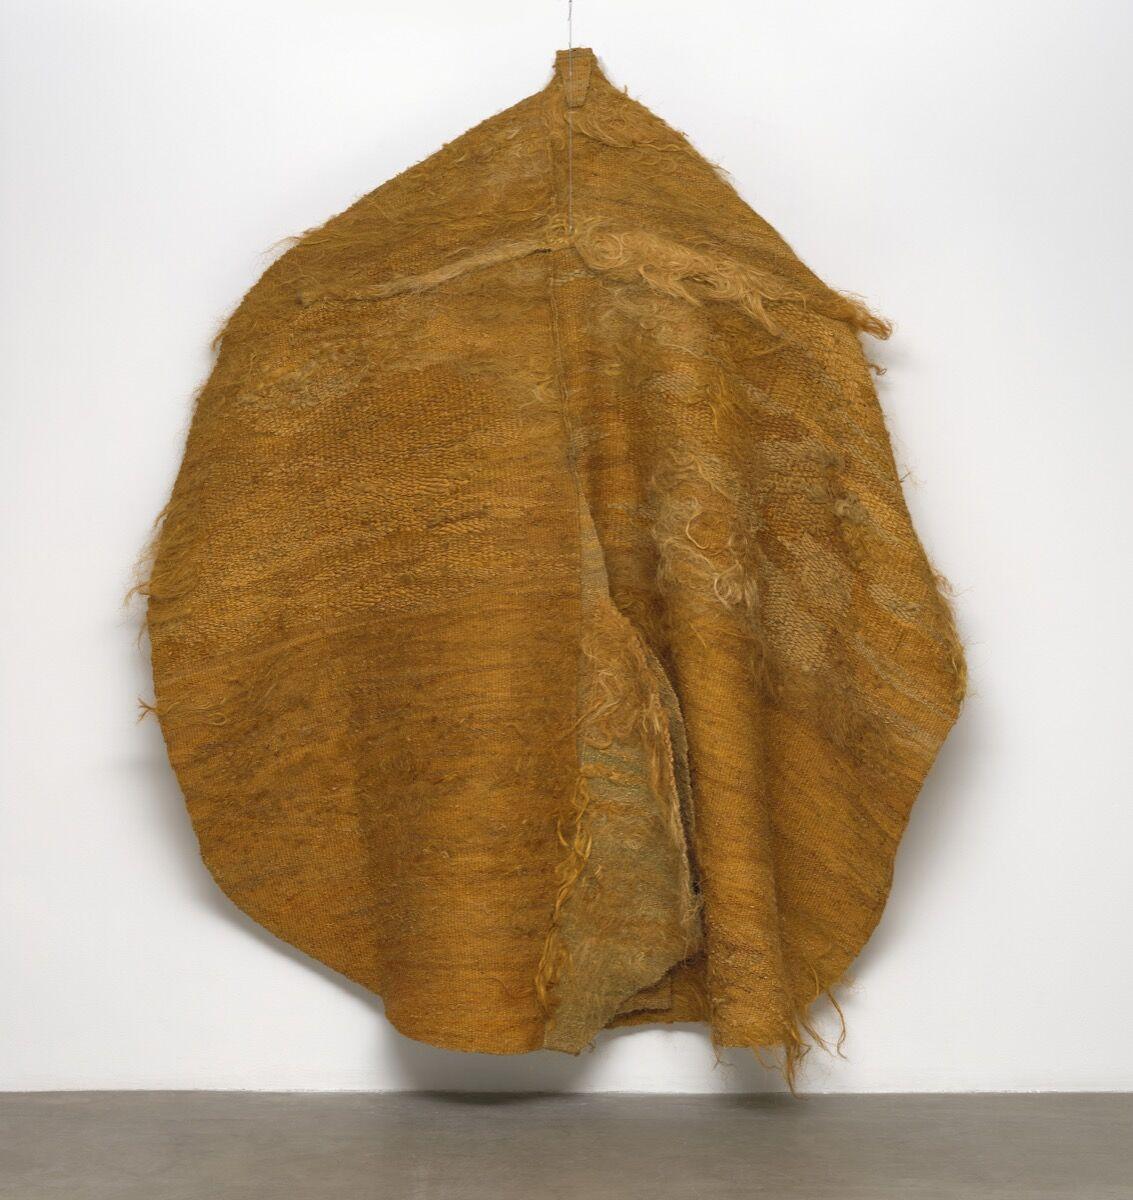 Magdalena Abakanowicz, Yellow Abakan, 1967-68. Courtesy of the Museum of Modern Art.